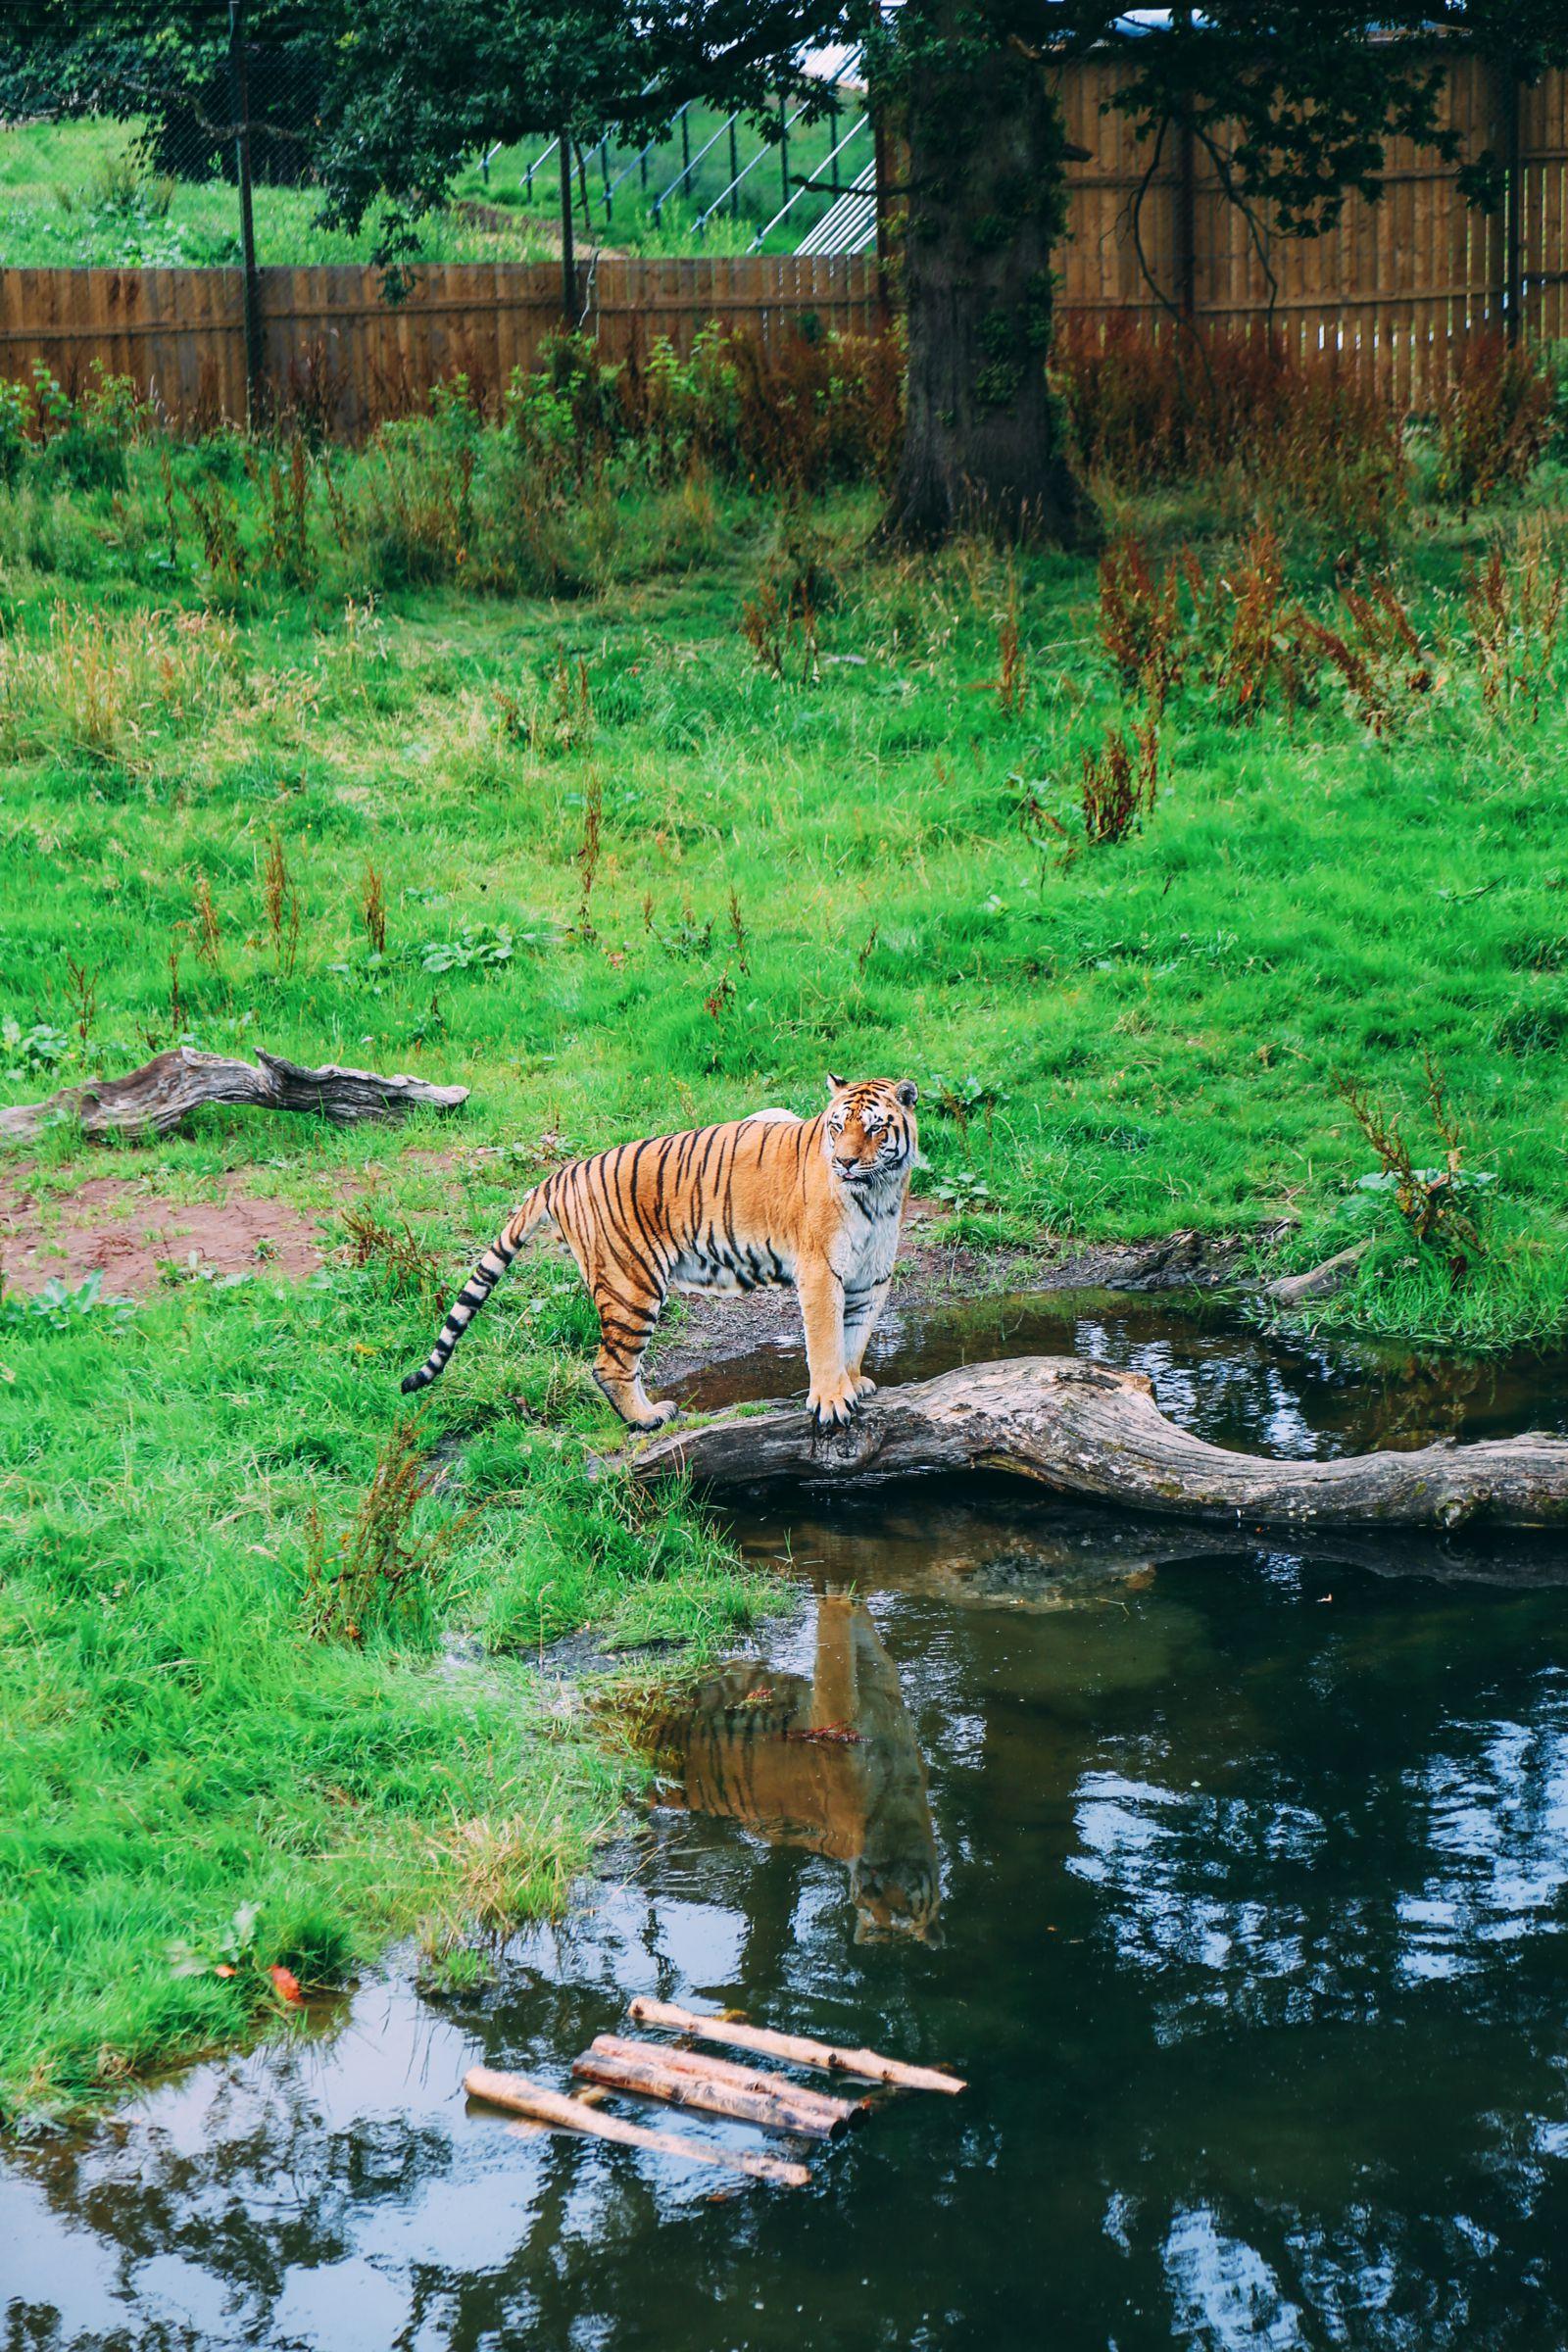 Safari In Scotland - The Photo Diary at Blair Drummond Safari and Adventure Park (24)